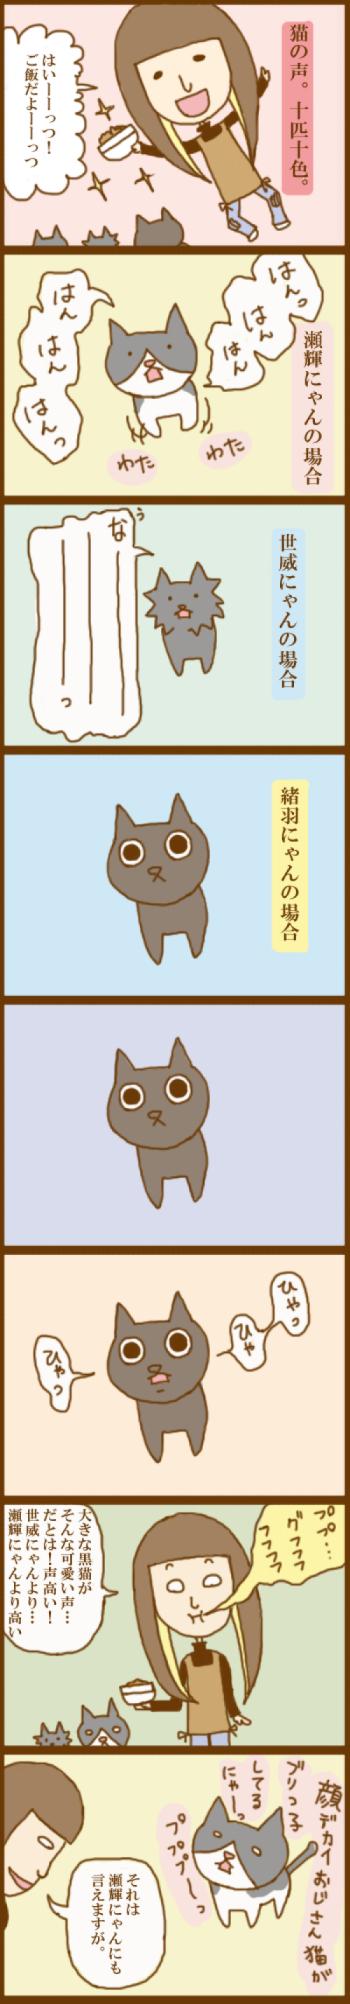 f:id:suzuokayu:20201031172107j:plain